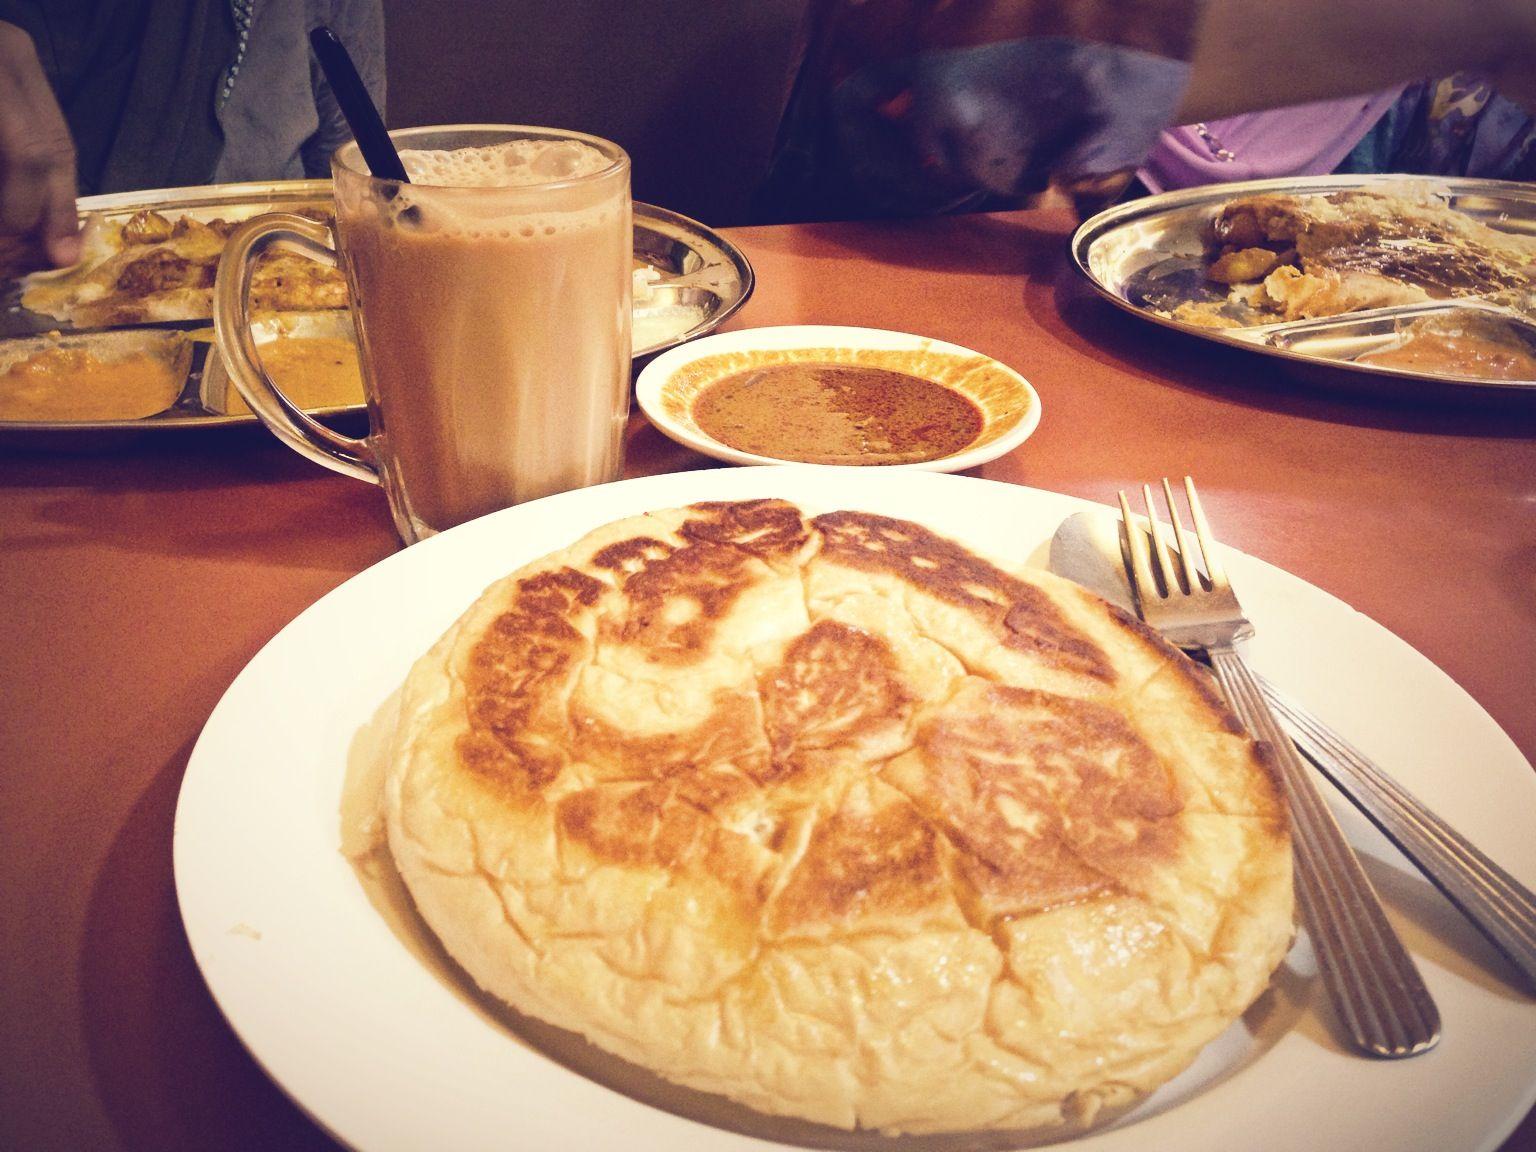 Roti arab singapore food pinterest for Arab cuisine singapore